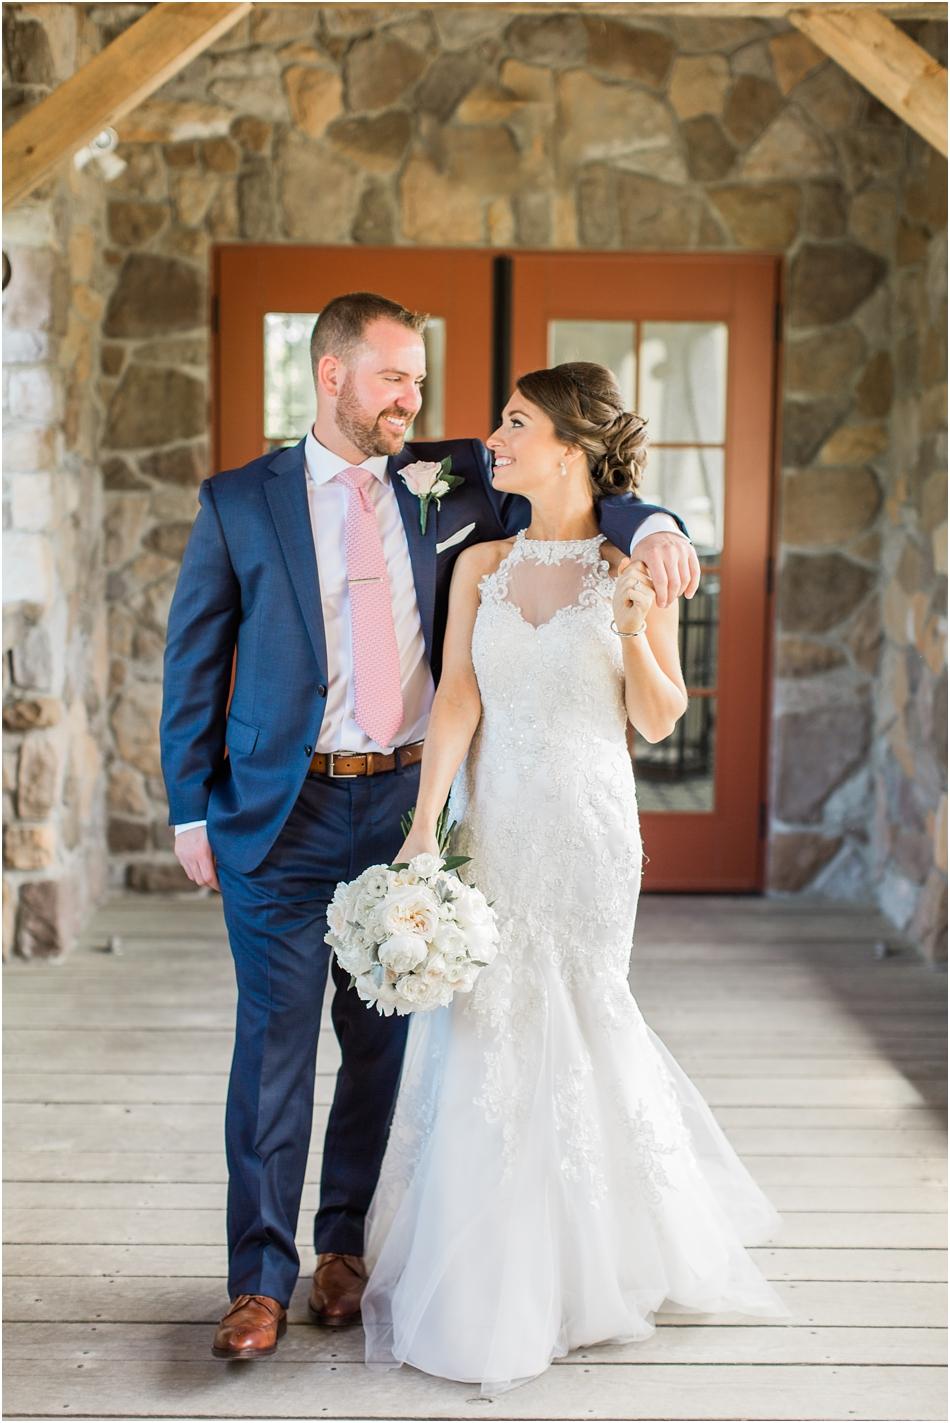 pine_hills_mirbeau_golf_club_boston_massachusetts_cape_cod_new_england_wedding_photographer_Meredith_Jane_Photography_photo_1690.jpg